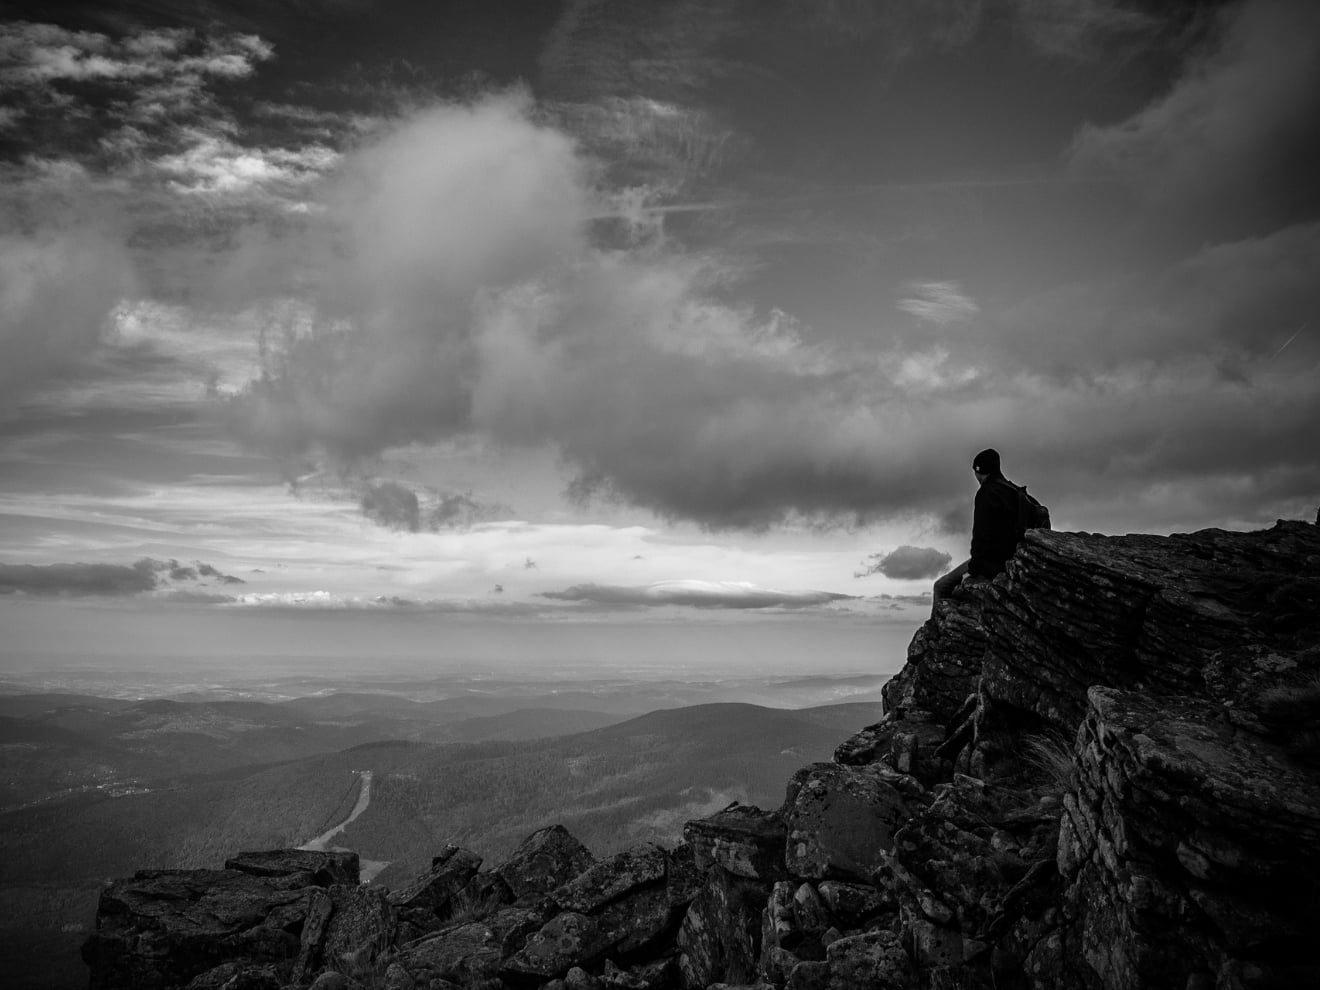 The Freudian Compulsion View In Depressive Suicidal Black Metal